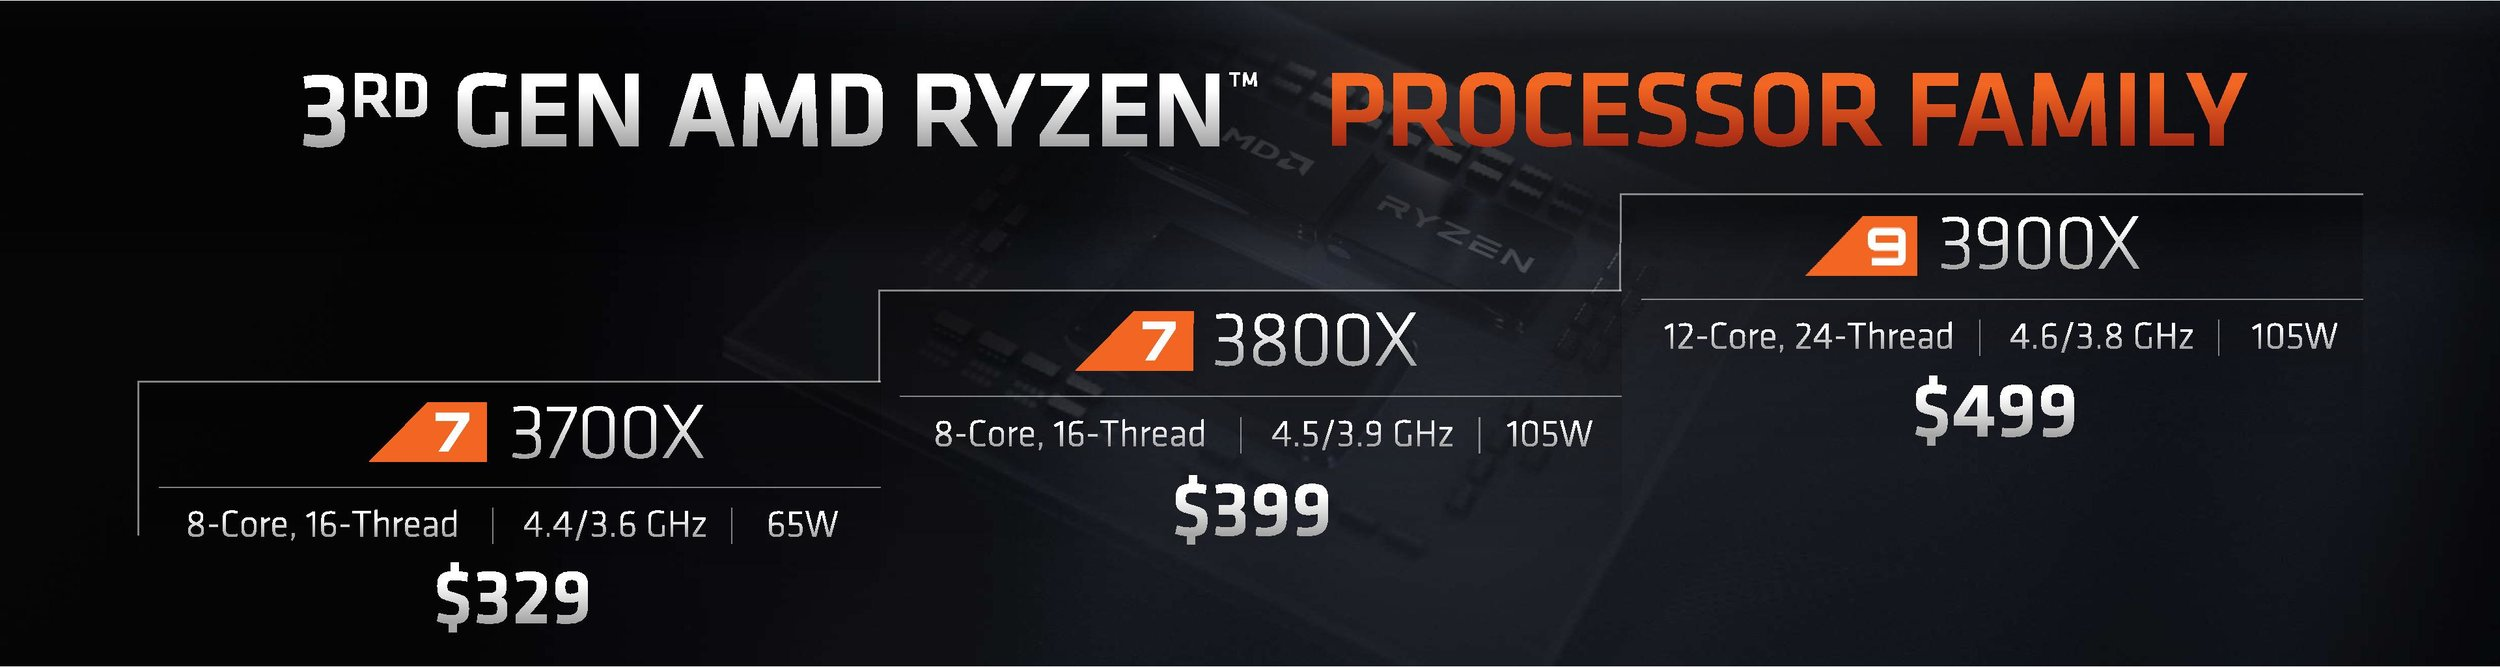 AMD Computex 2019 Slide Deck